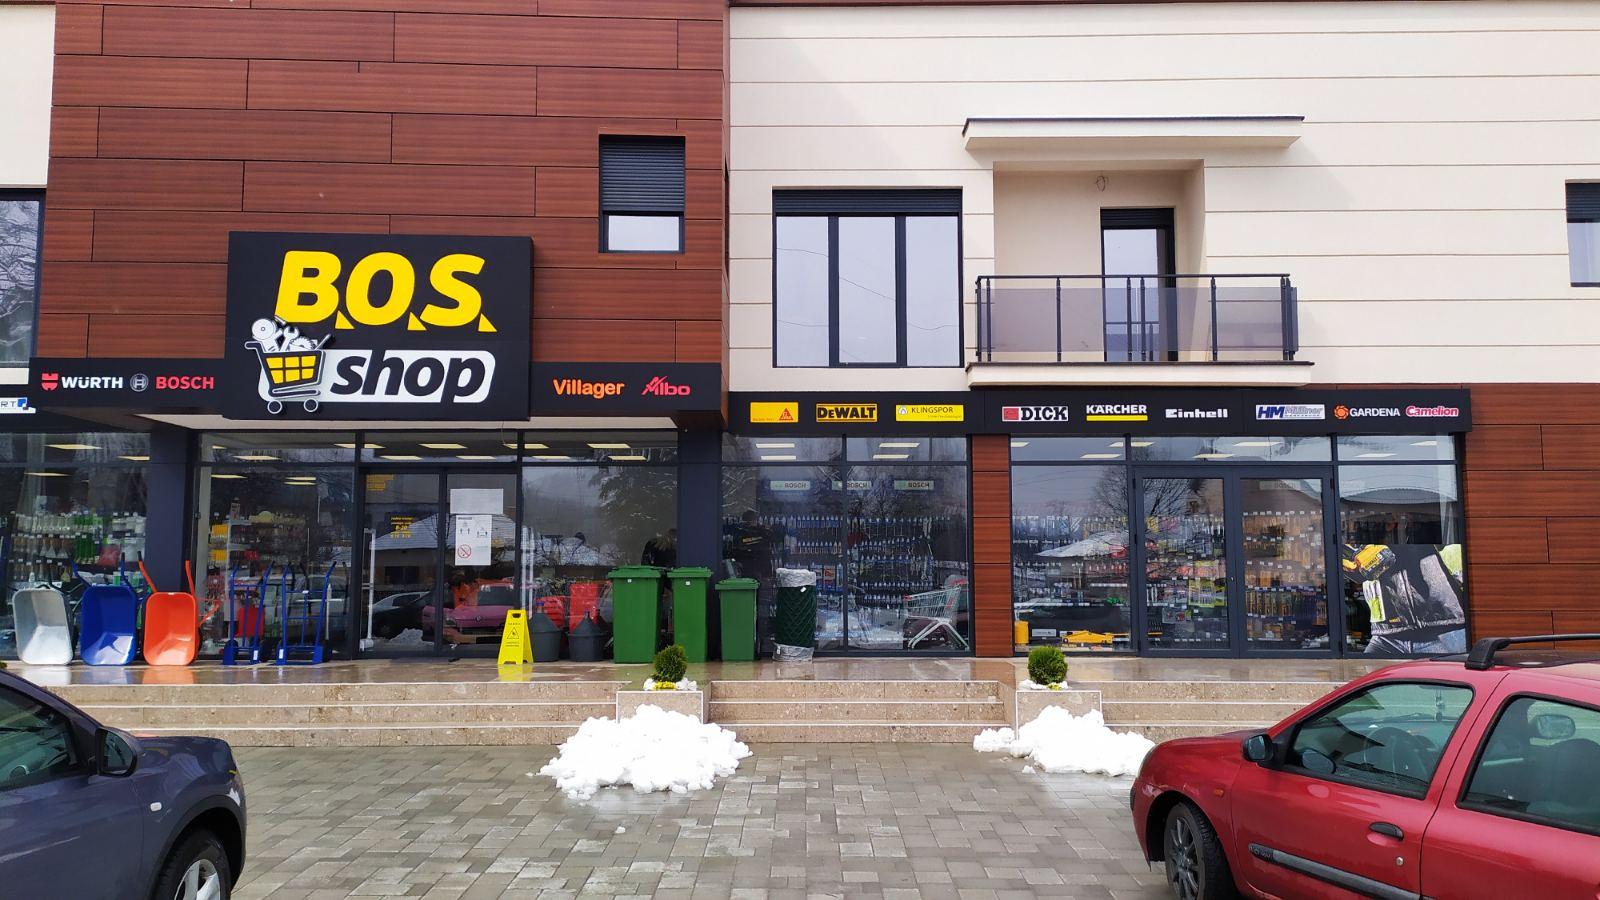 B.O.S. Shop 1